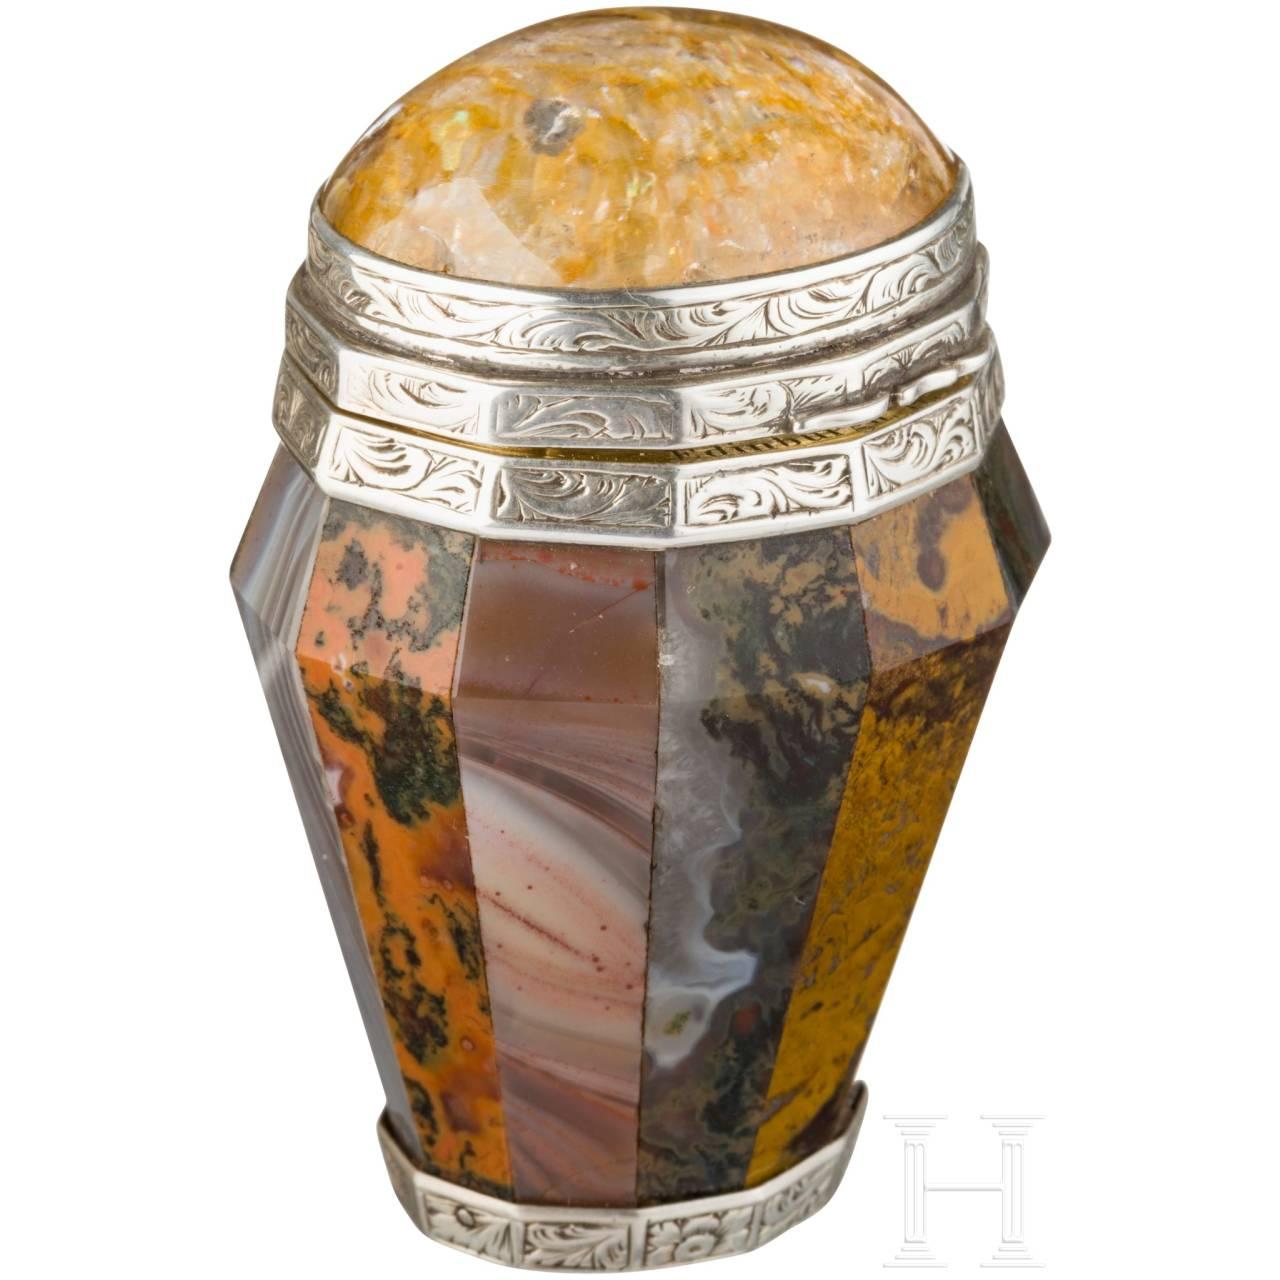 A smell box made of semi-precious stone, Edinburgh, dated 1853